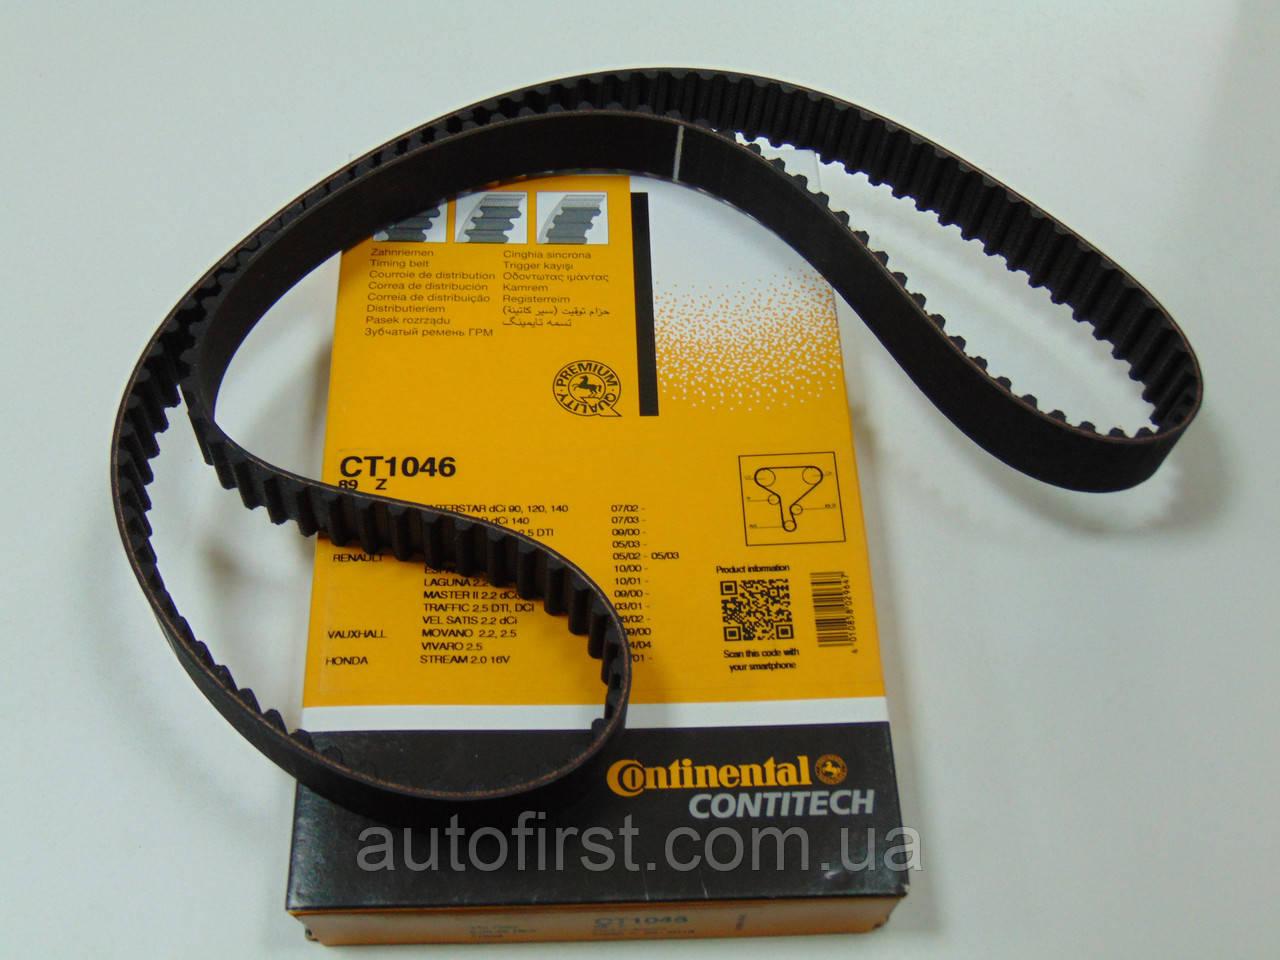 Contitech CT1046 Ремень ГРМ Opel, Renault